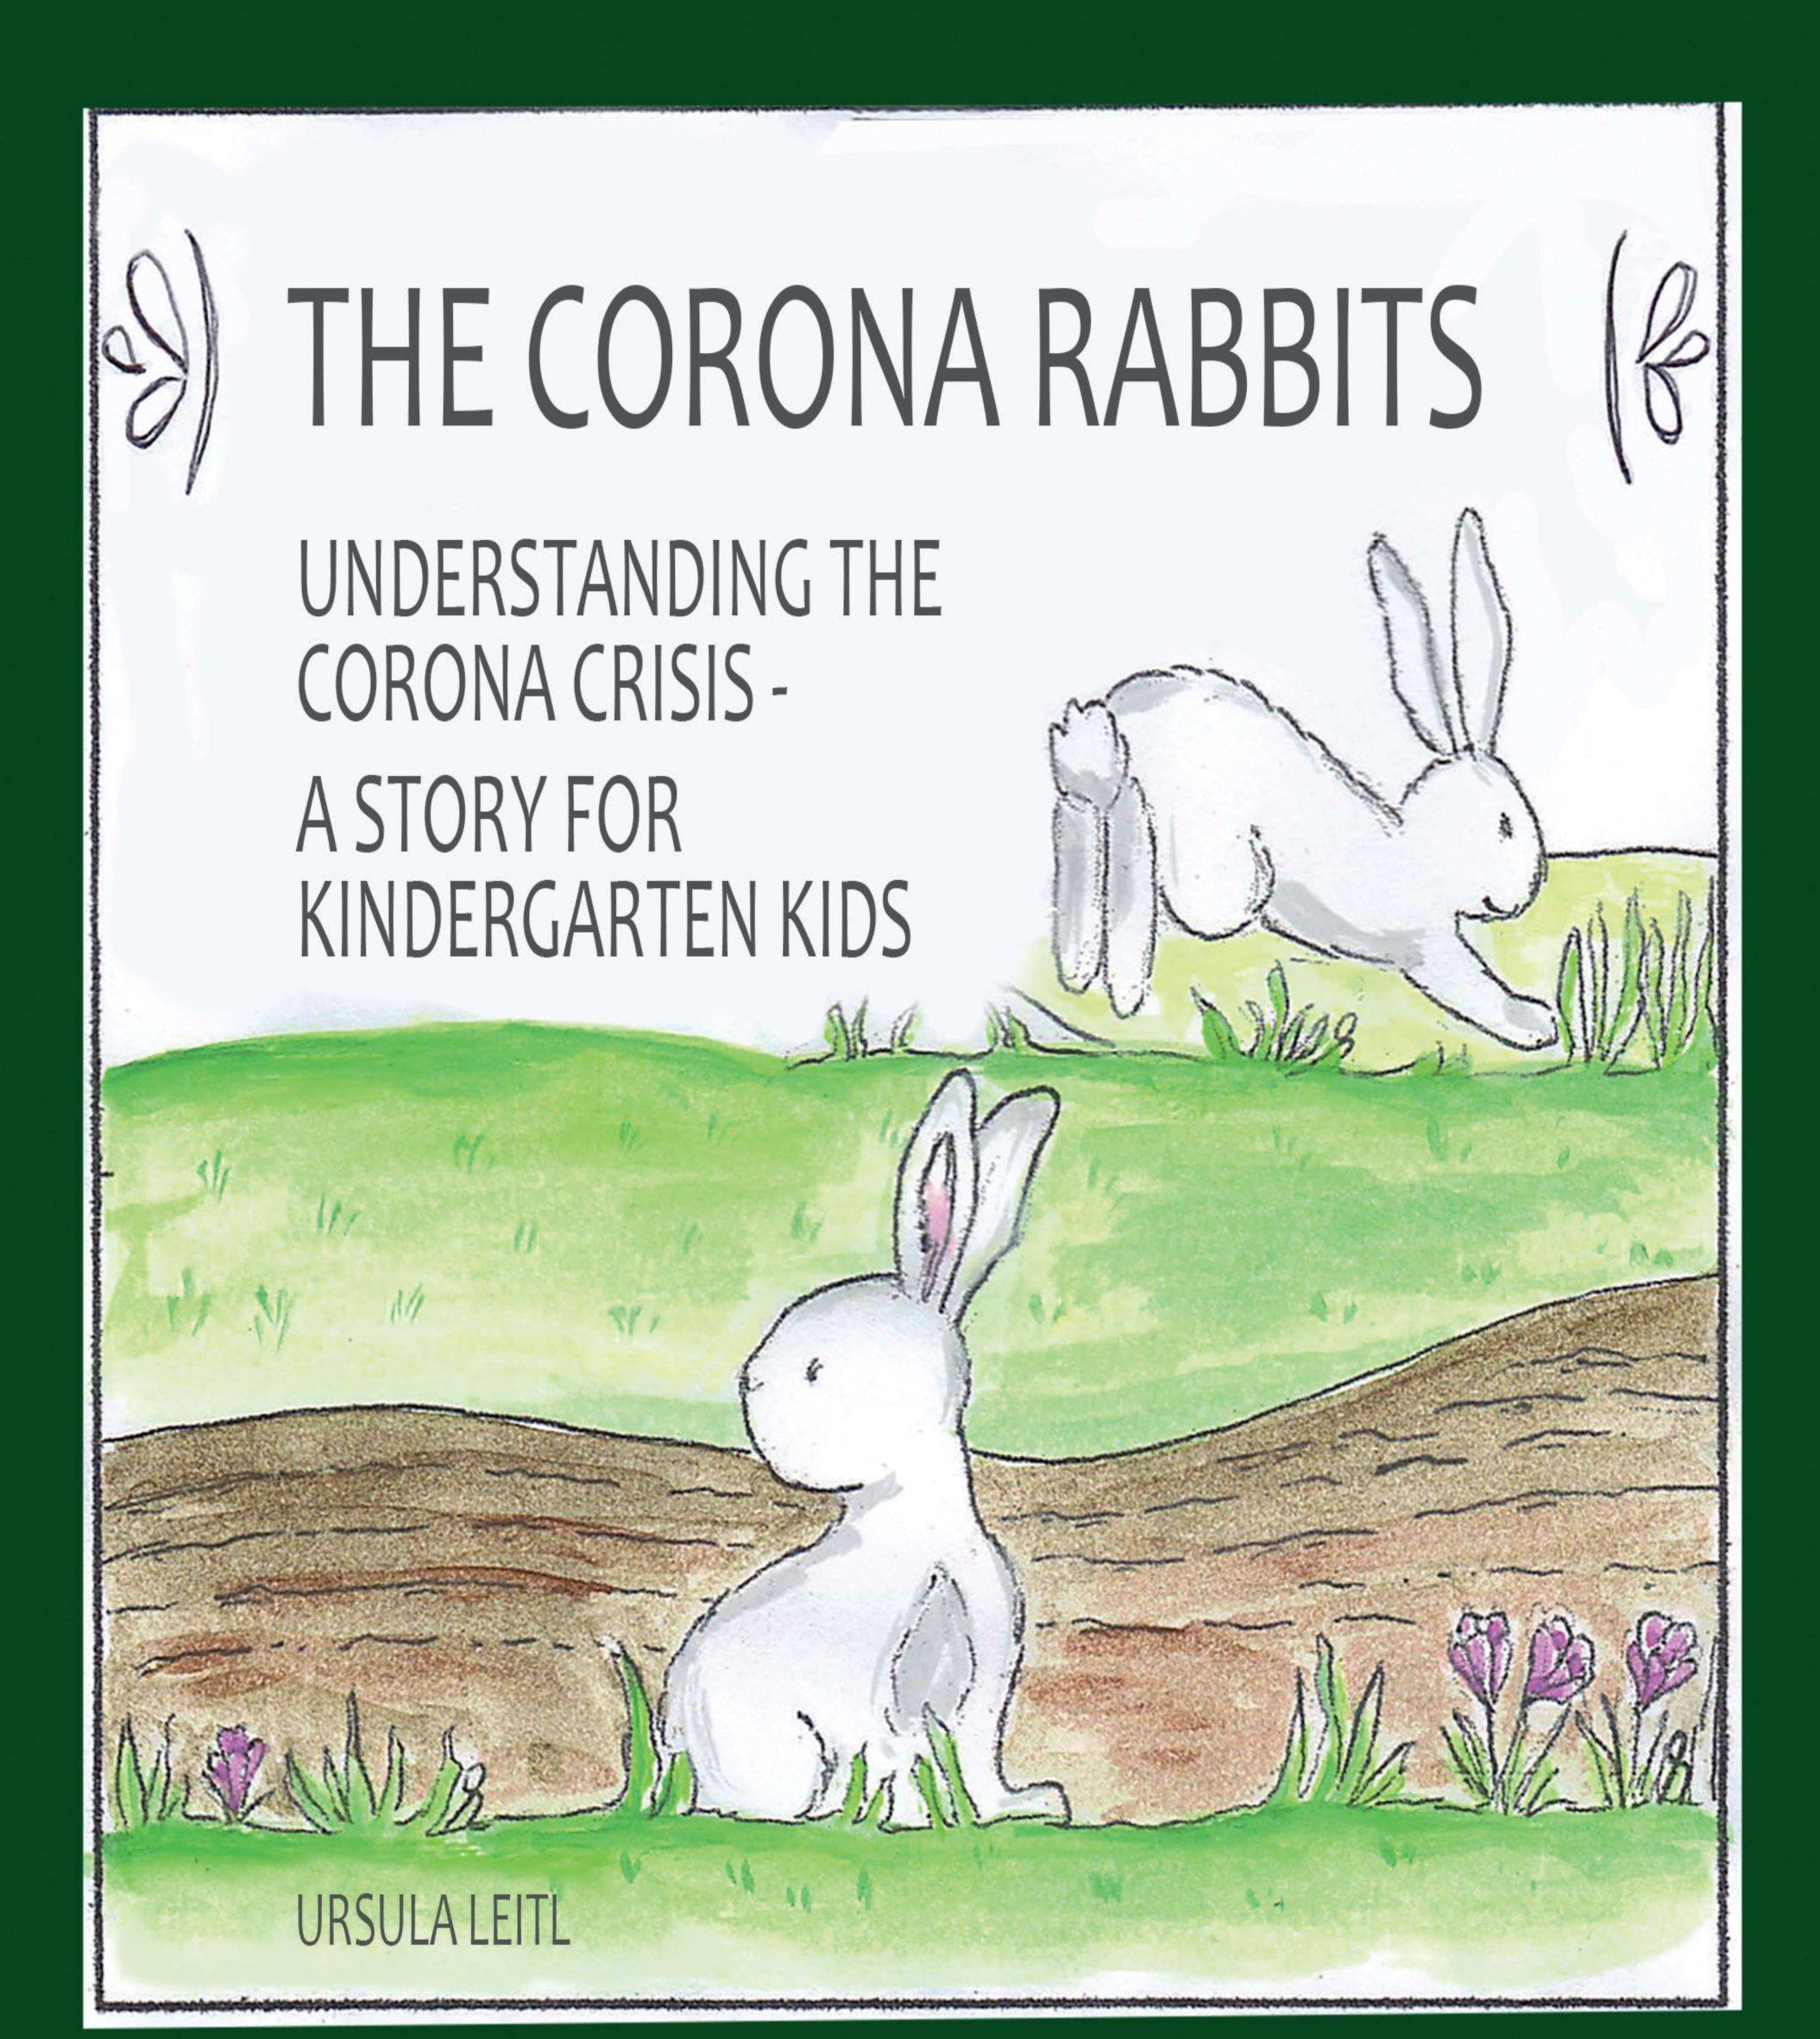 The Corona Rabbits - Story for Kindergarten Kids